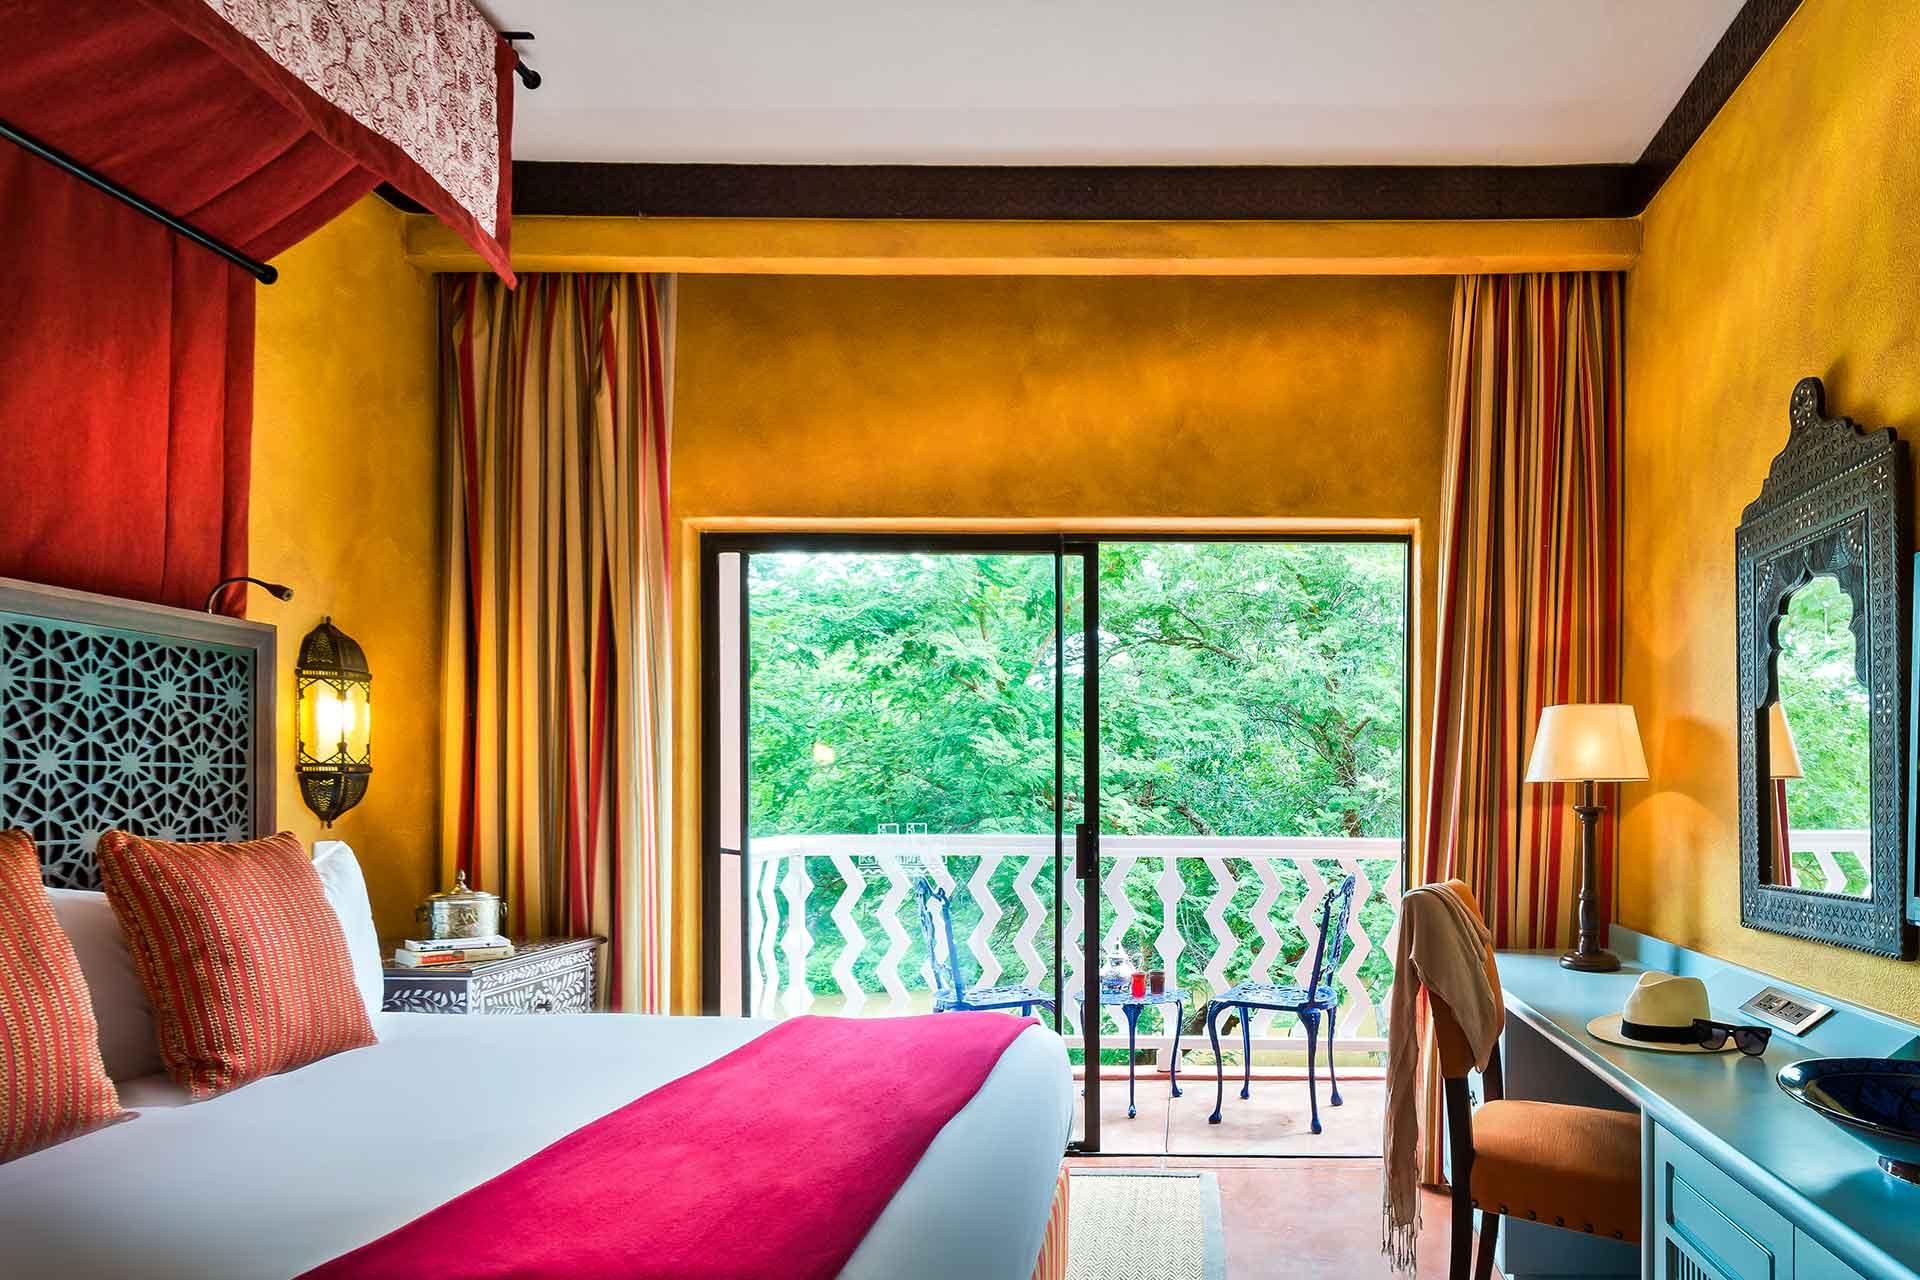 Rooms of AVANI Victoria Falls formerly known as Zambezi Hotel